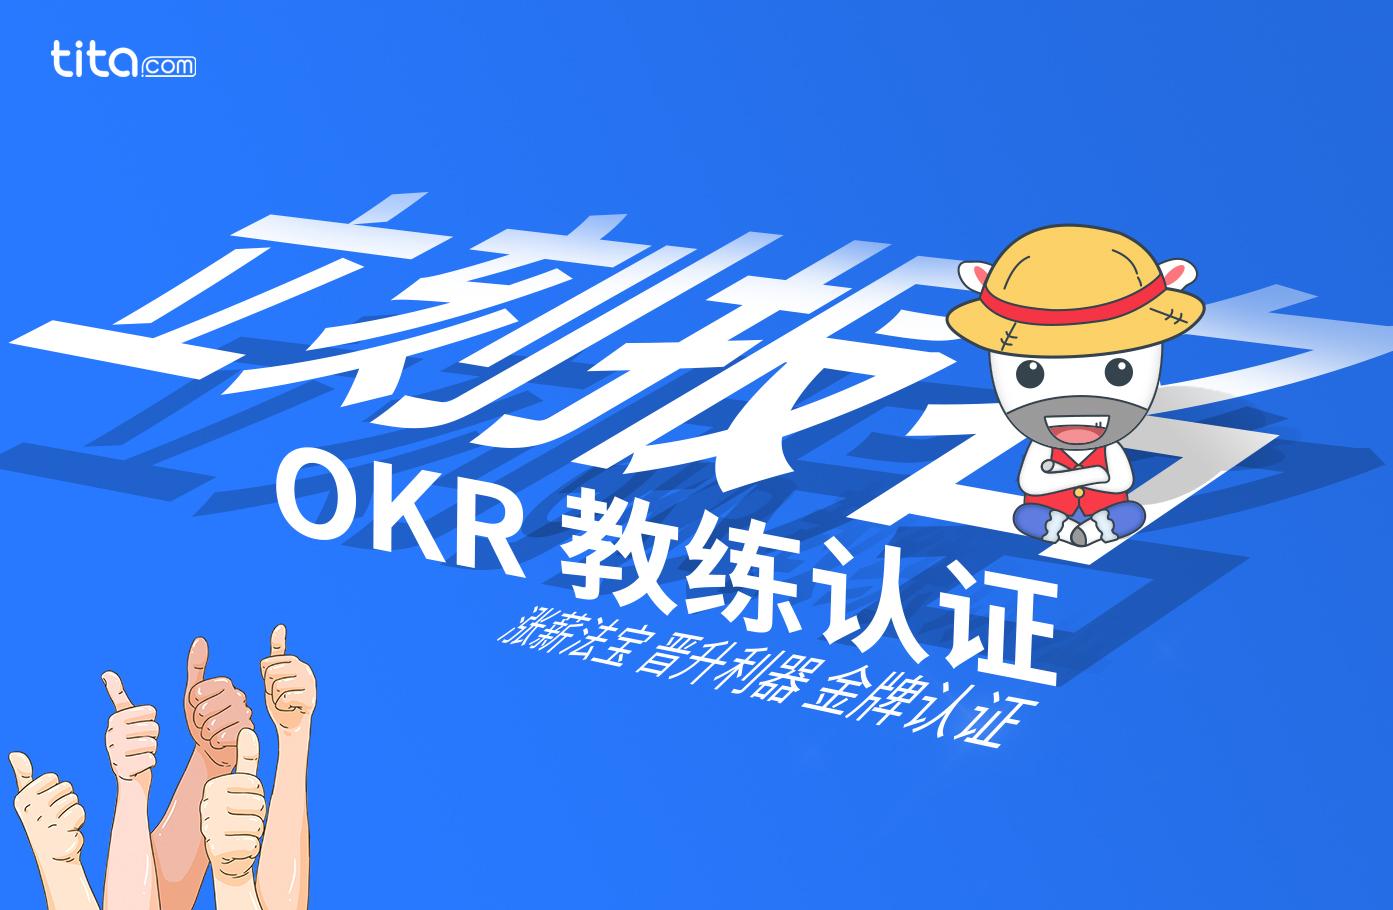 OKR教练技术:第一次实践OKR